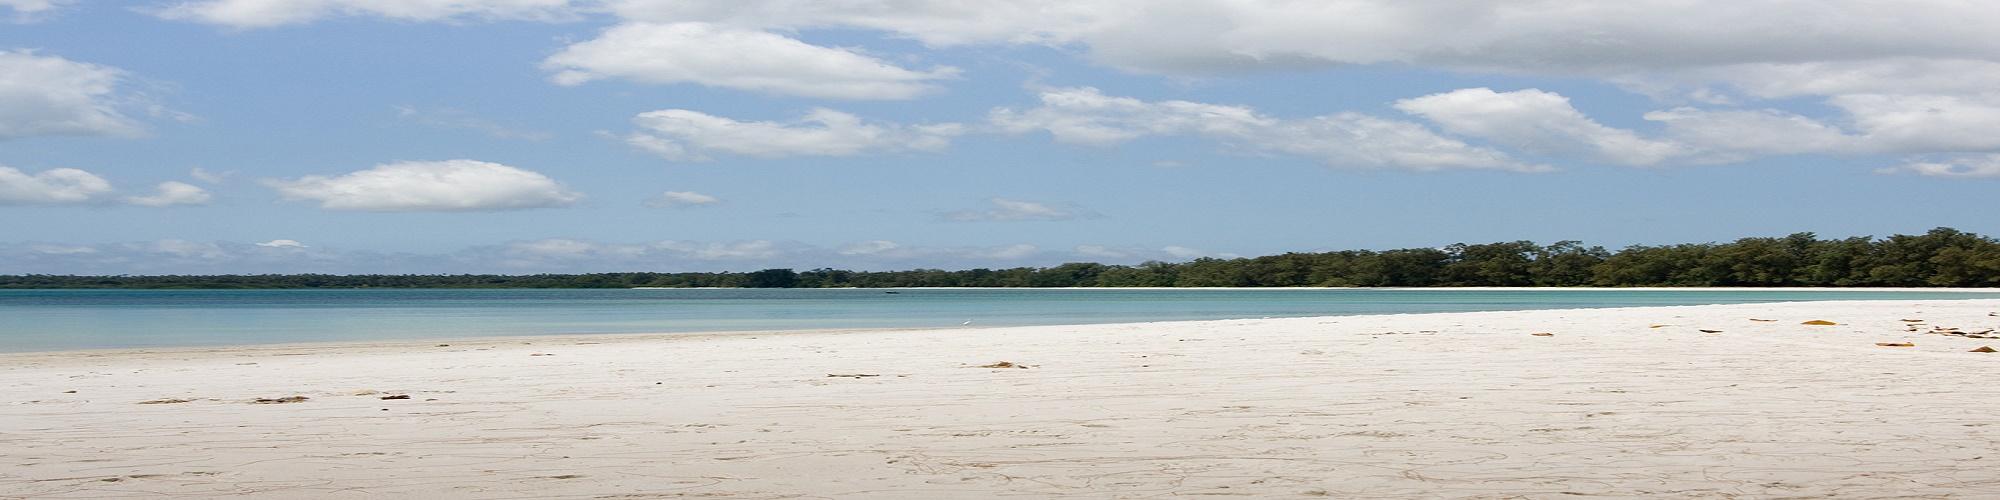 Pemba Island Zanzibar TANZANIA